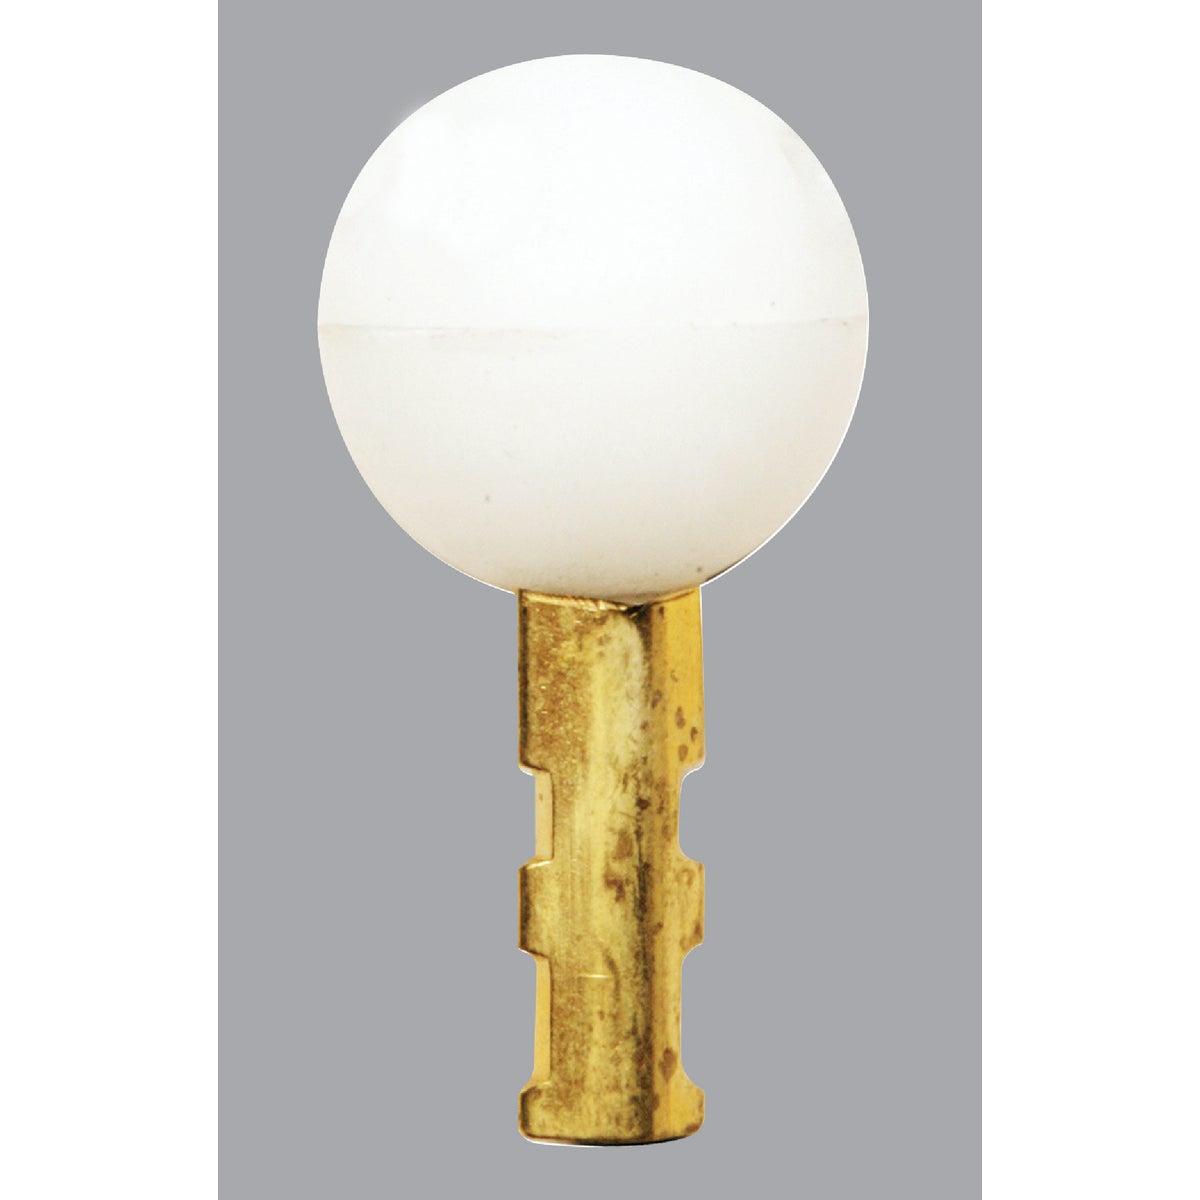 Plumb Pak/Keeney Mfg. DIAL STYLE FAUCET BALL 405345